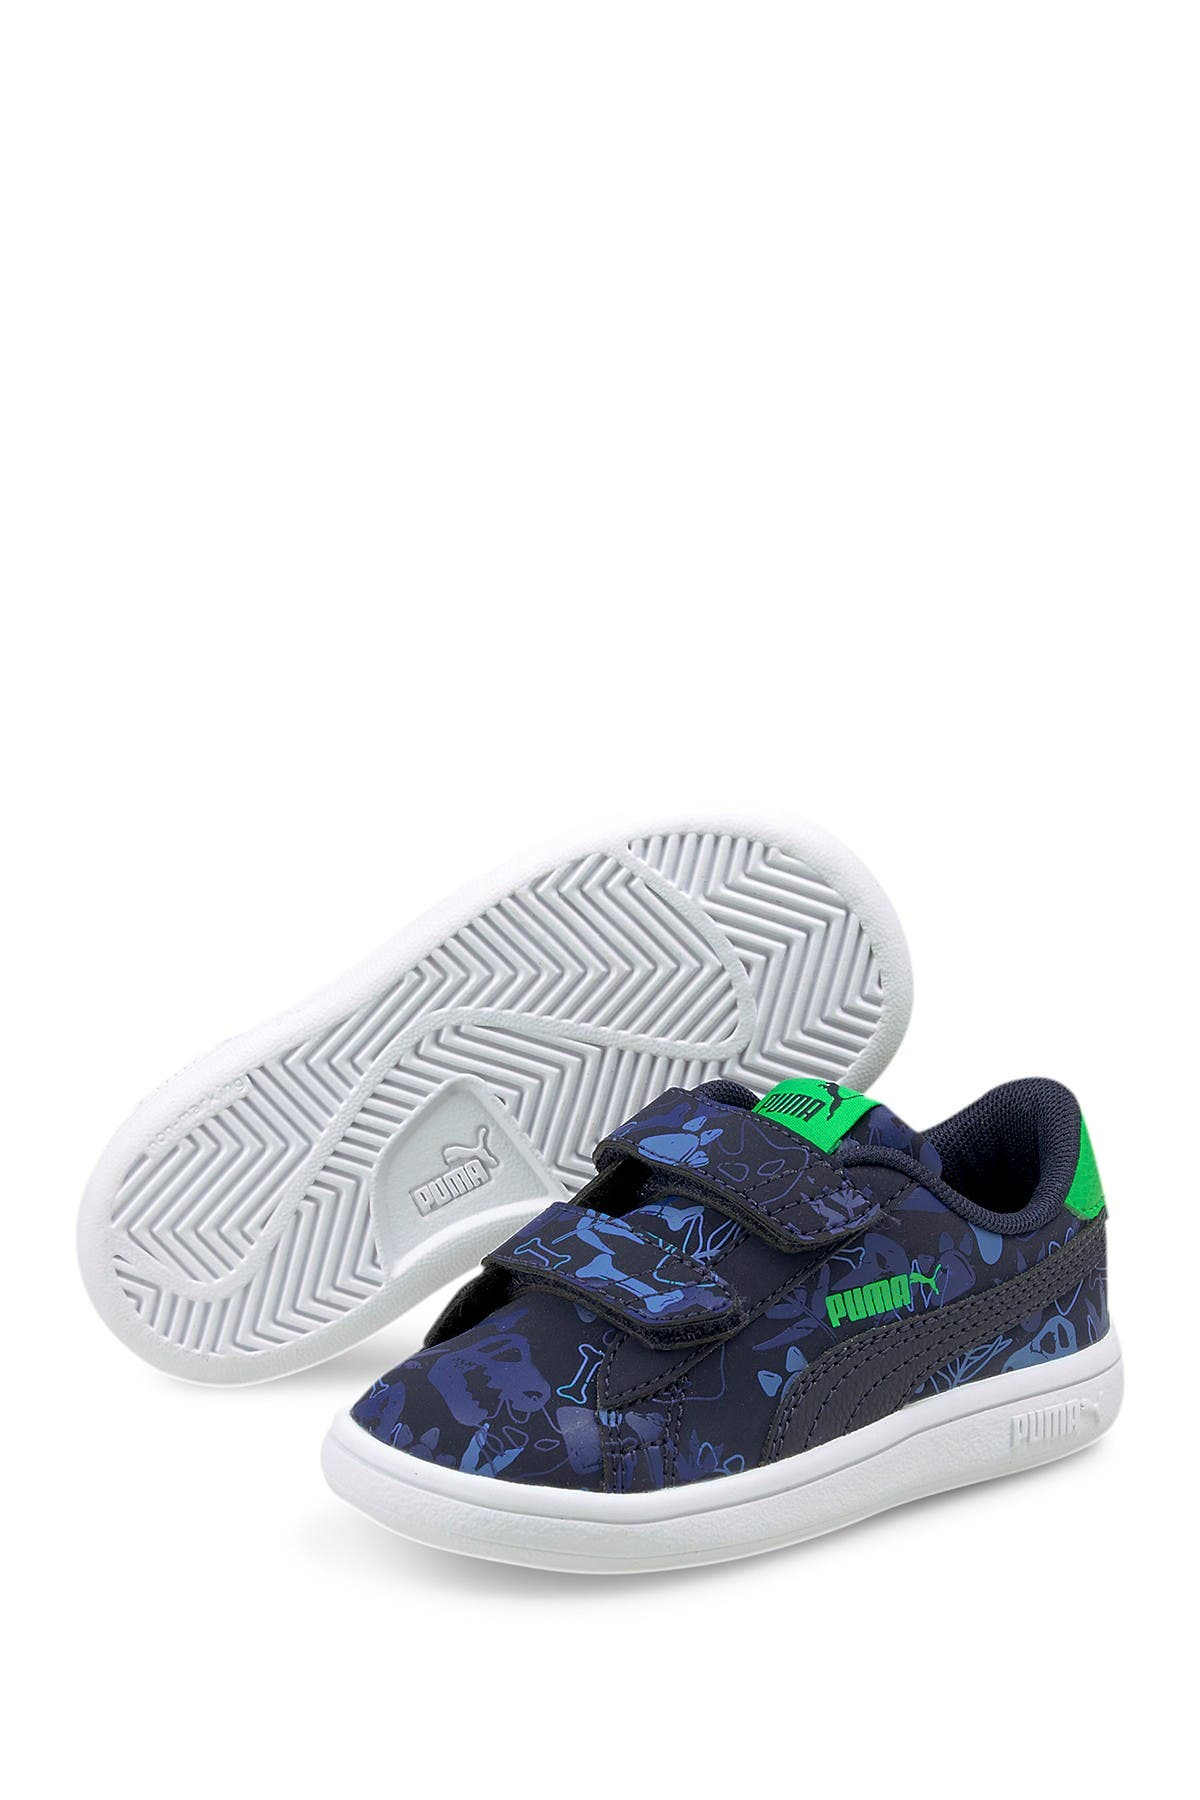 Image of PUMA Smash V2 Archeo Summer V Sneaker